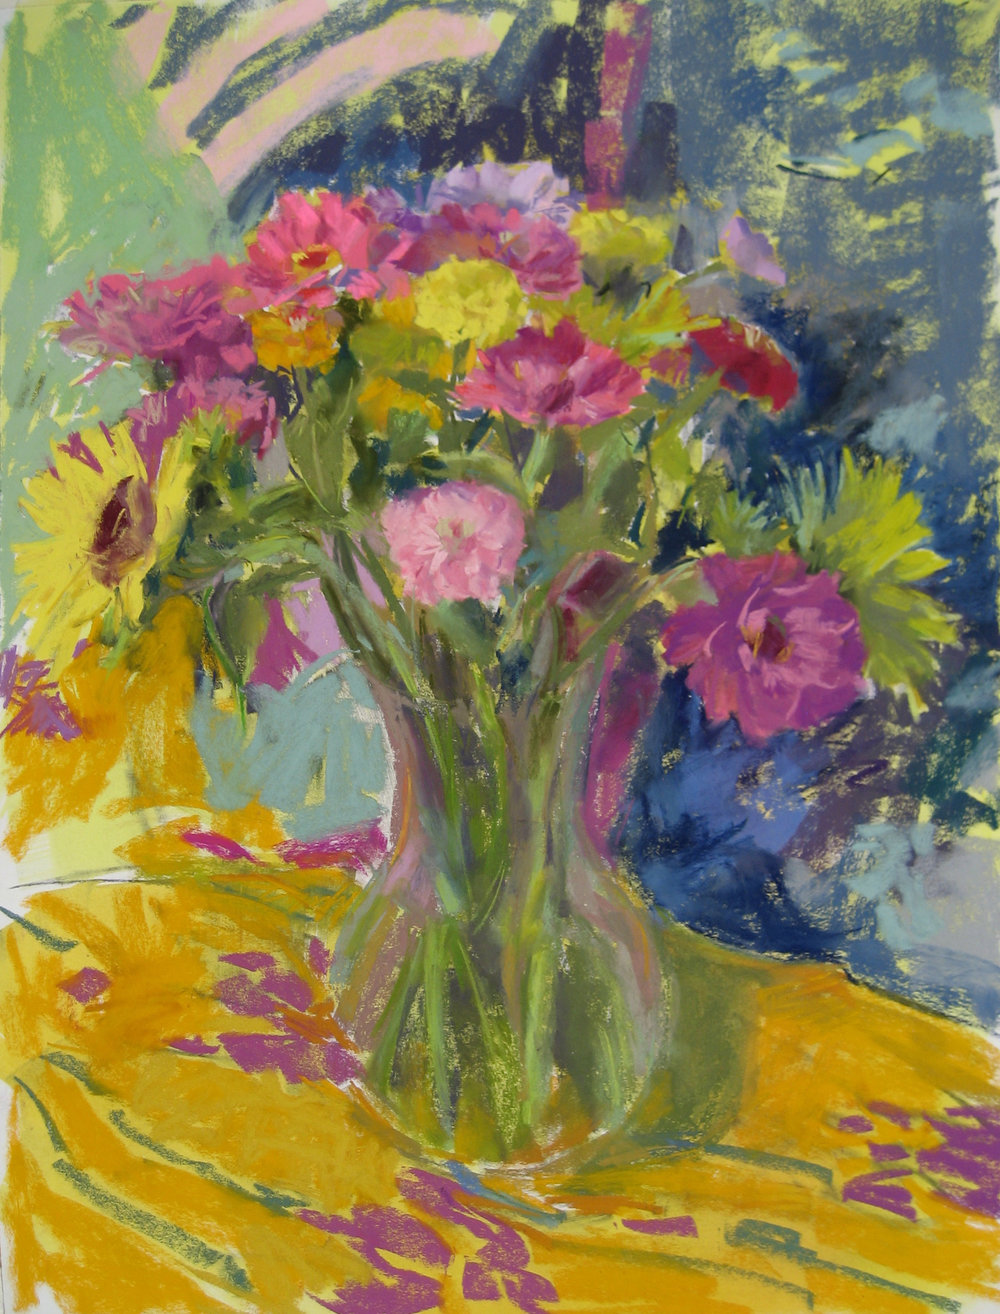 End of Summer Bouquet